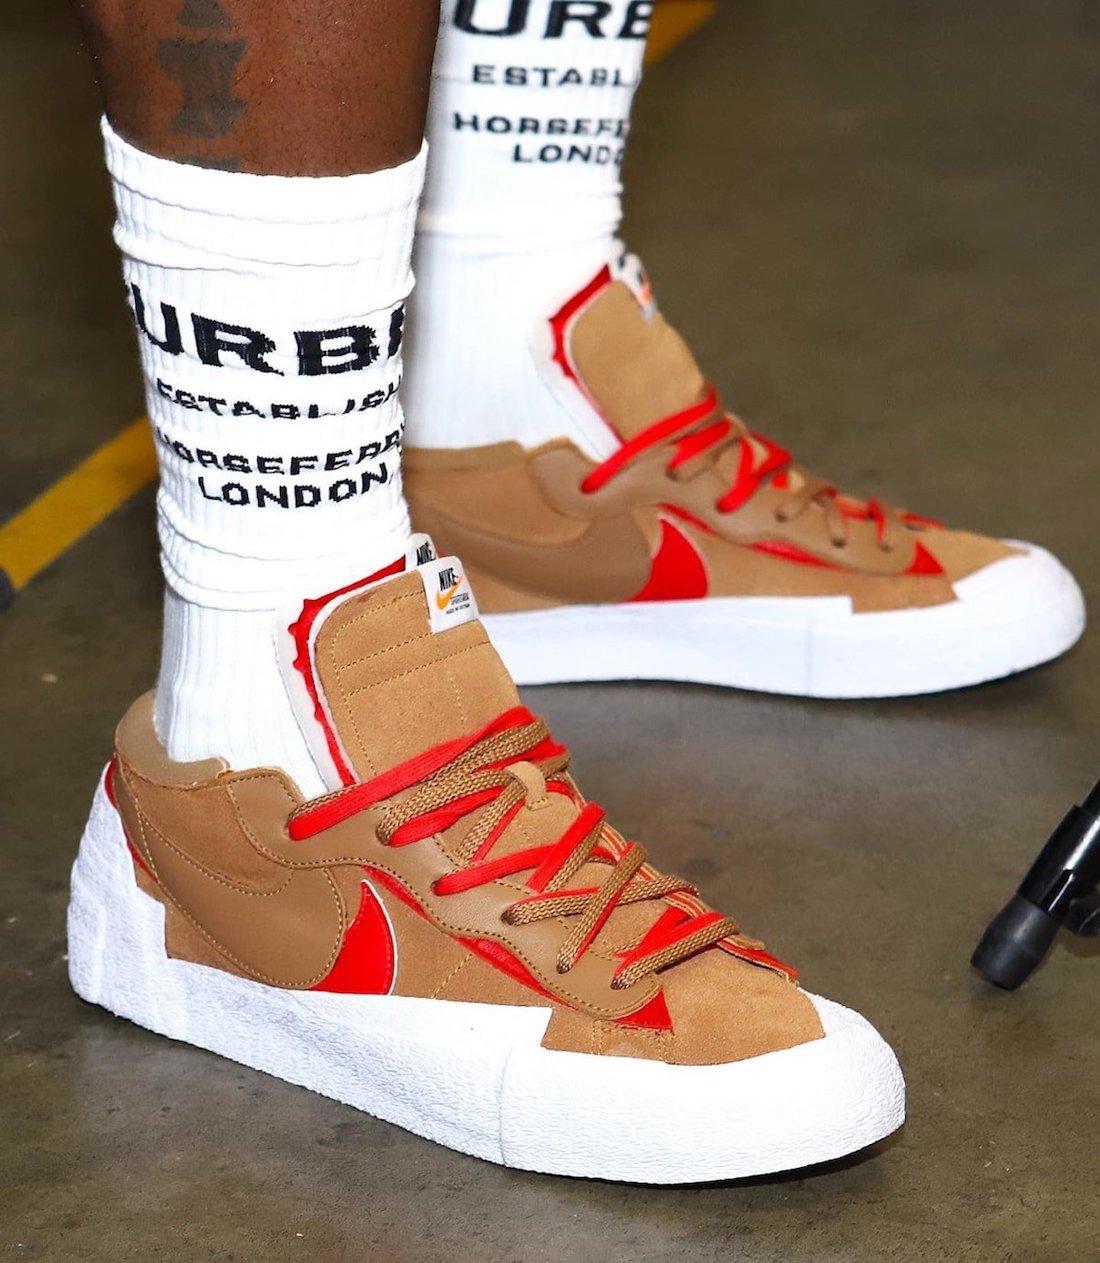 Sacai Nike Blazer Low Light British Tan DD1877-200 Release Date Info